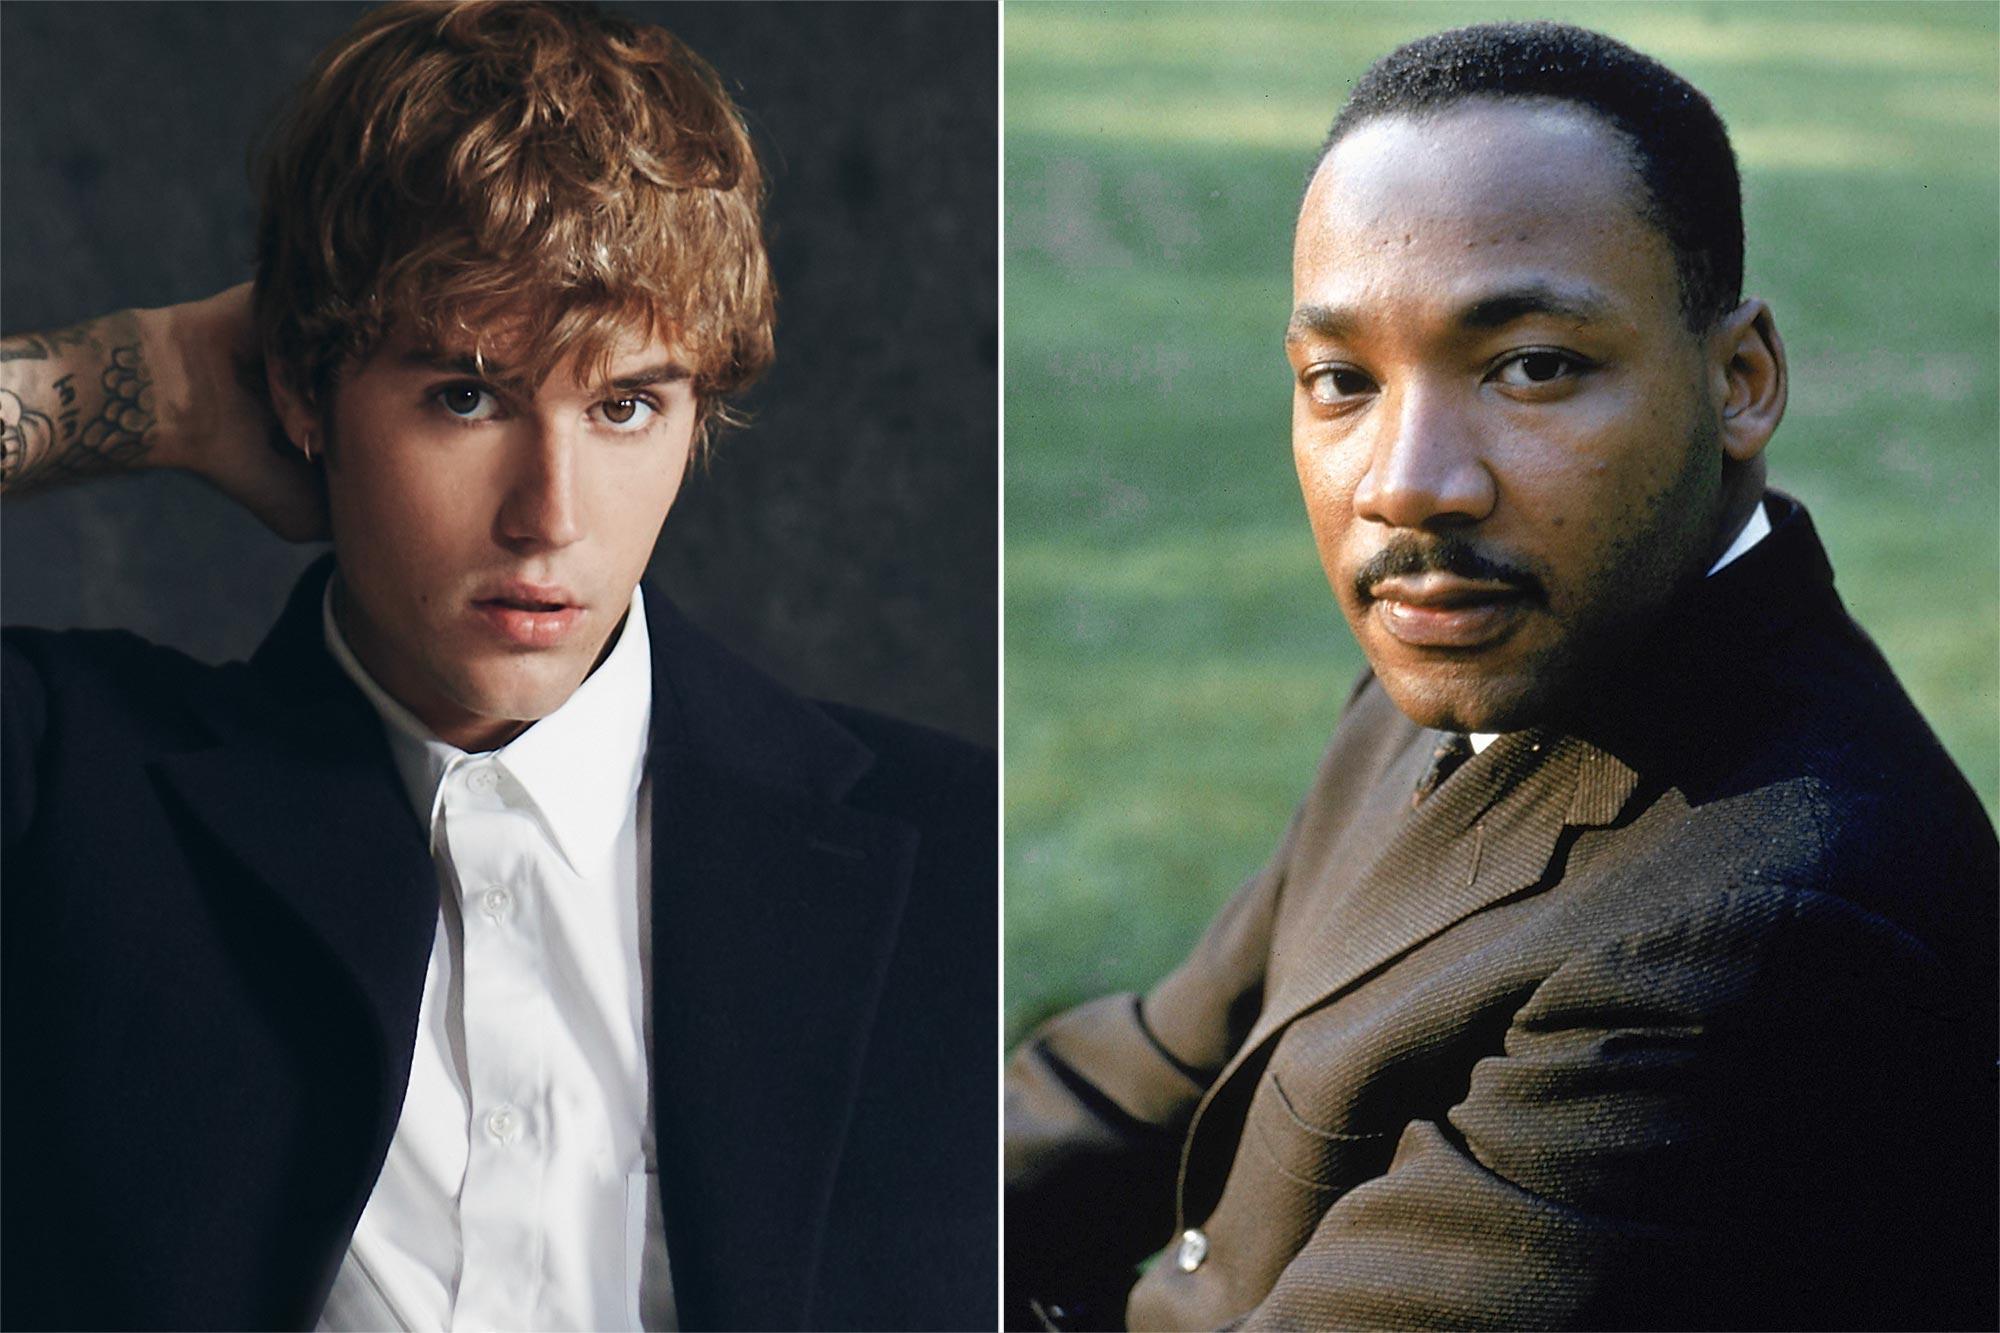 Justin Bieber, Martin Luther King Jr.